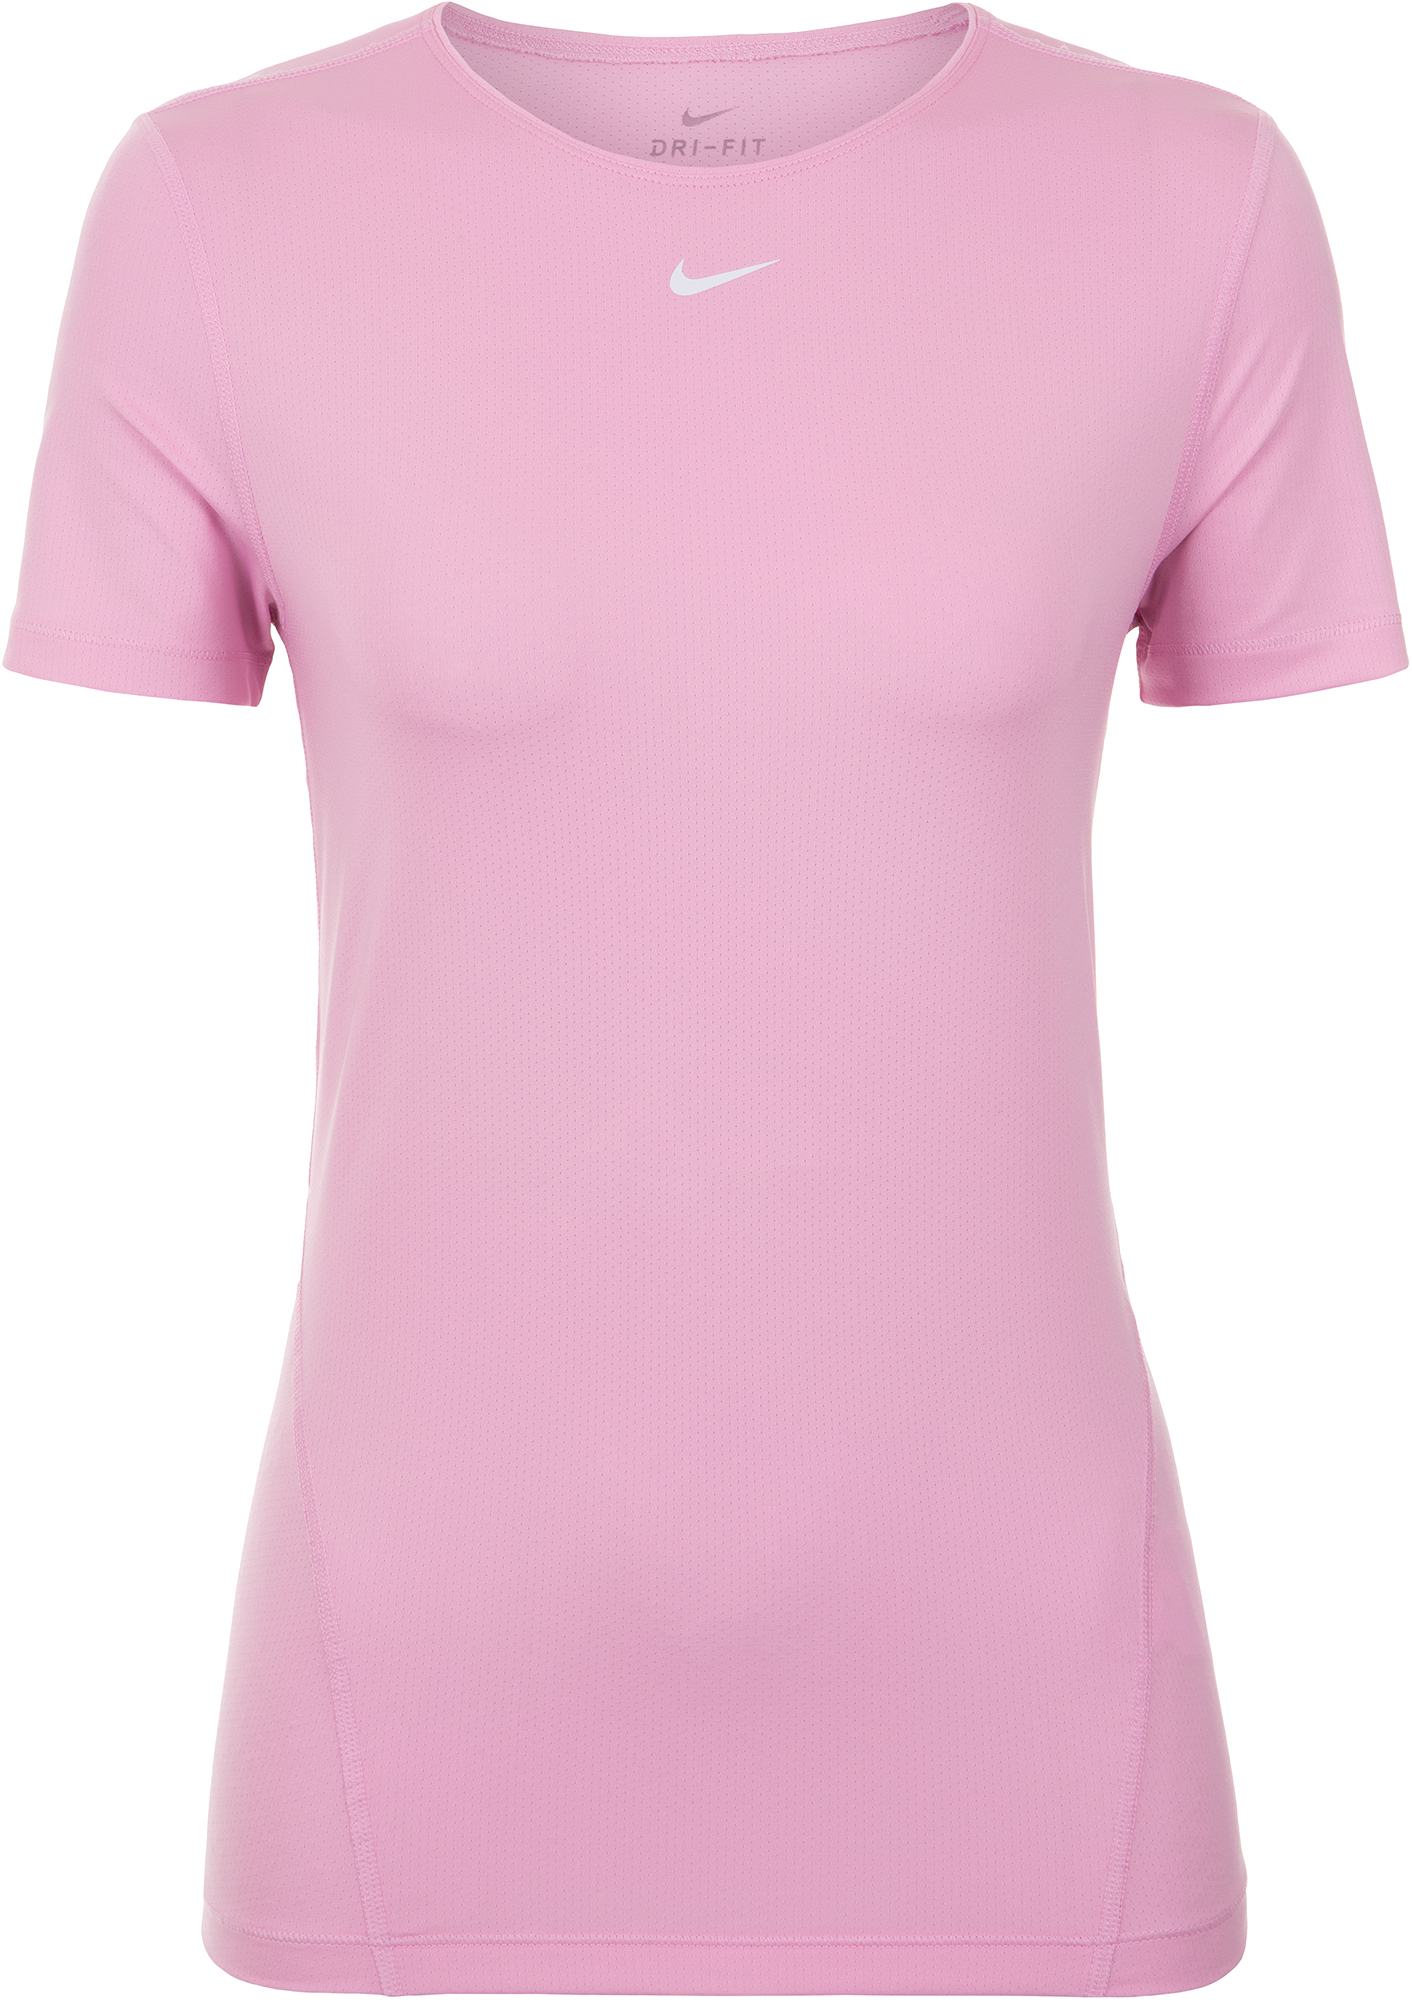 Nike Футболка женская Nike Pro, размер 40-42 xtep женская тонкая воздухопроницаемая спортивная футболка